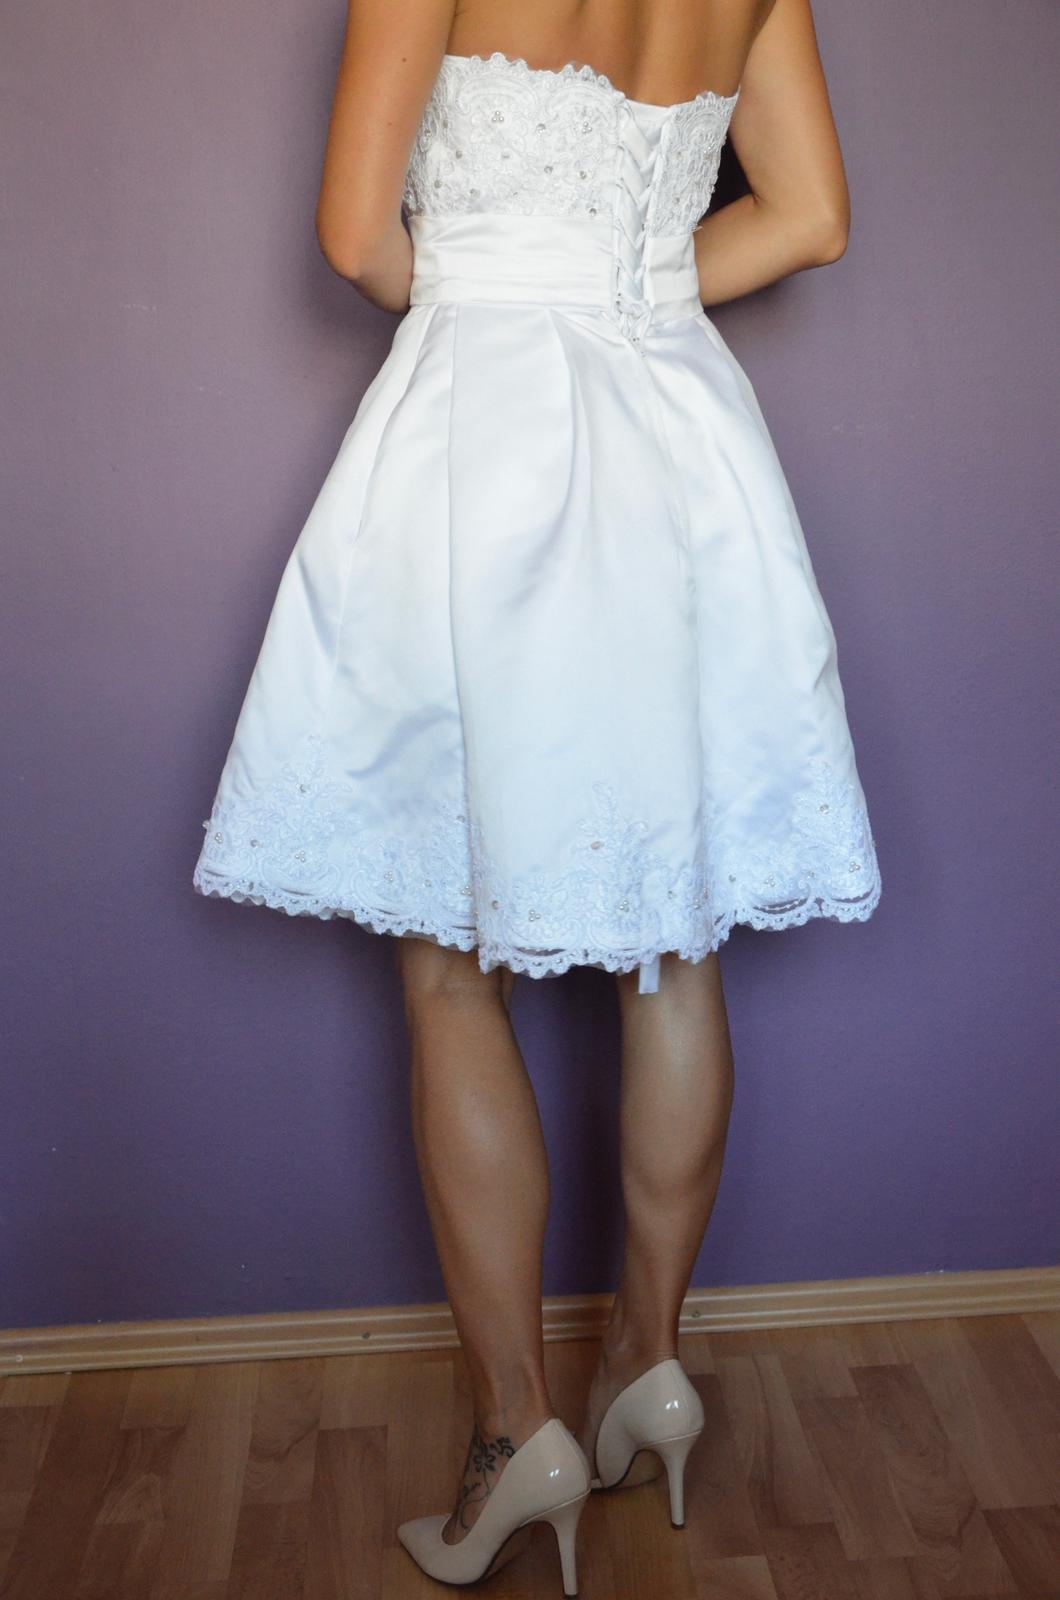 beb36639d84c Krátke svadobné šaty - velkosť 34-36-38